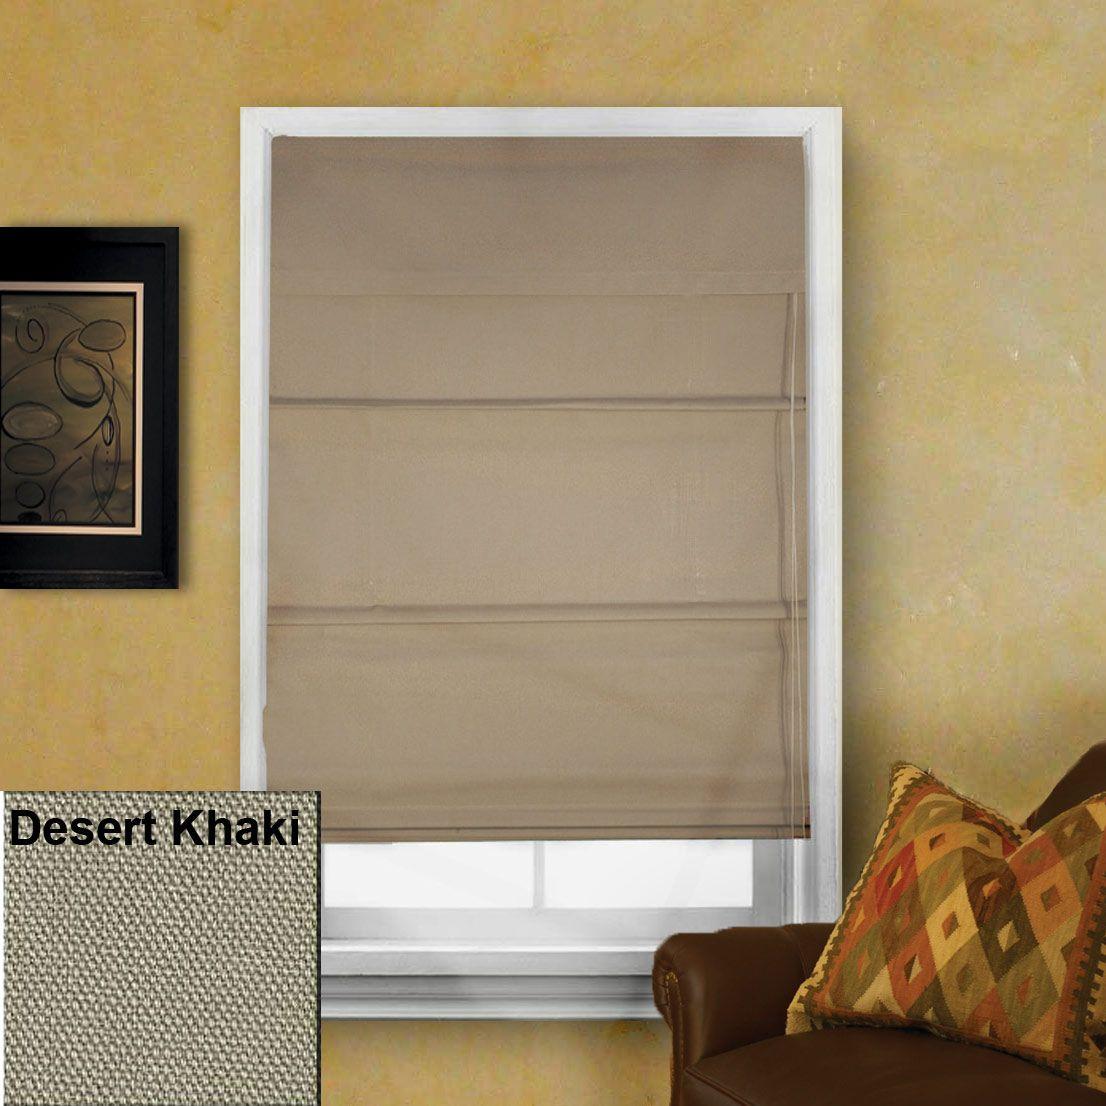 Thermal Lined Roman Shade - Desert Khaki - Window Blind Outlet